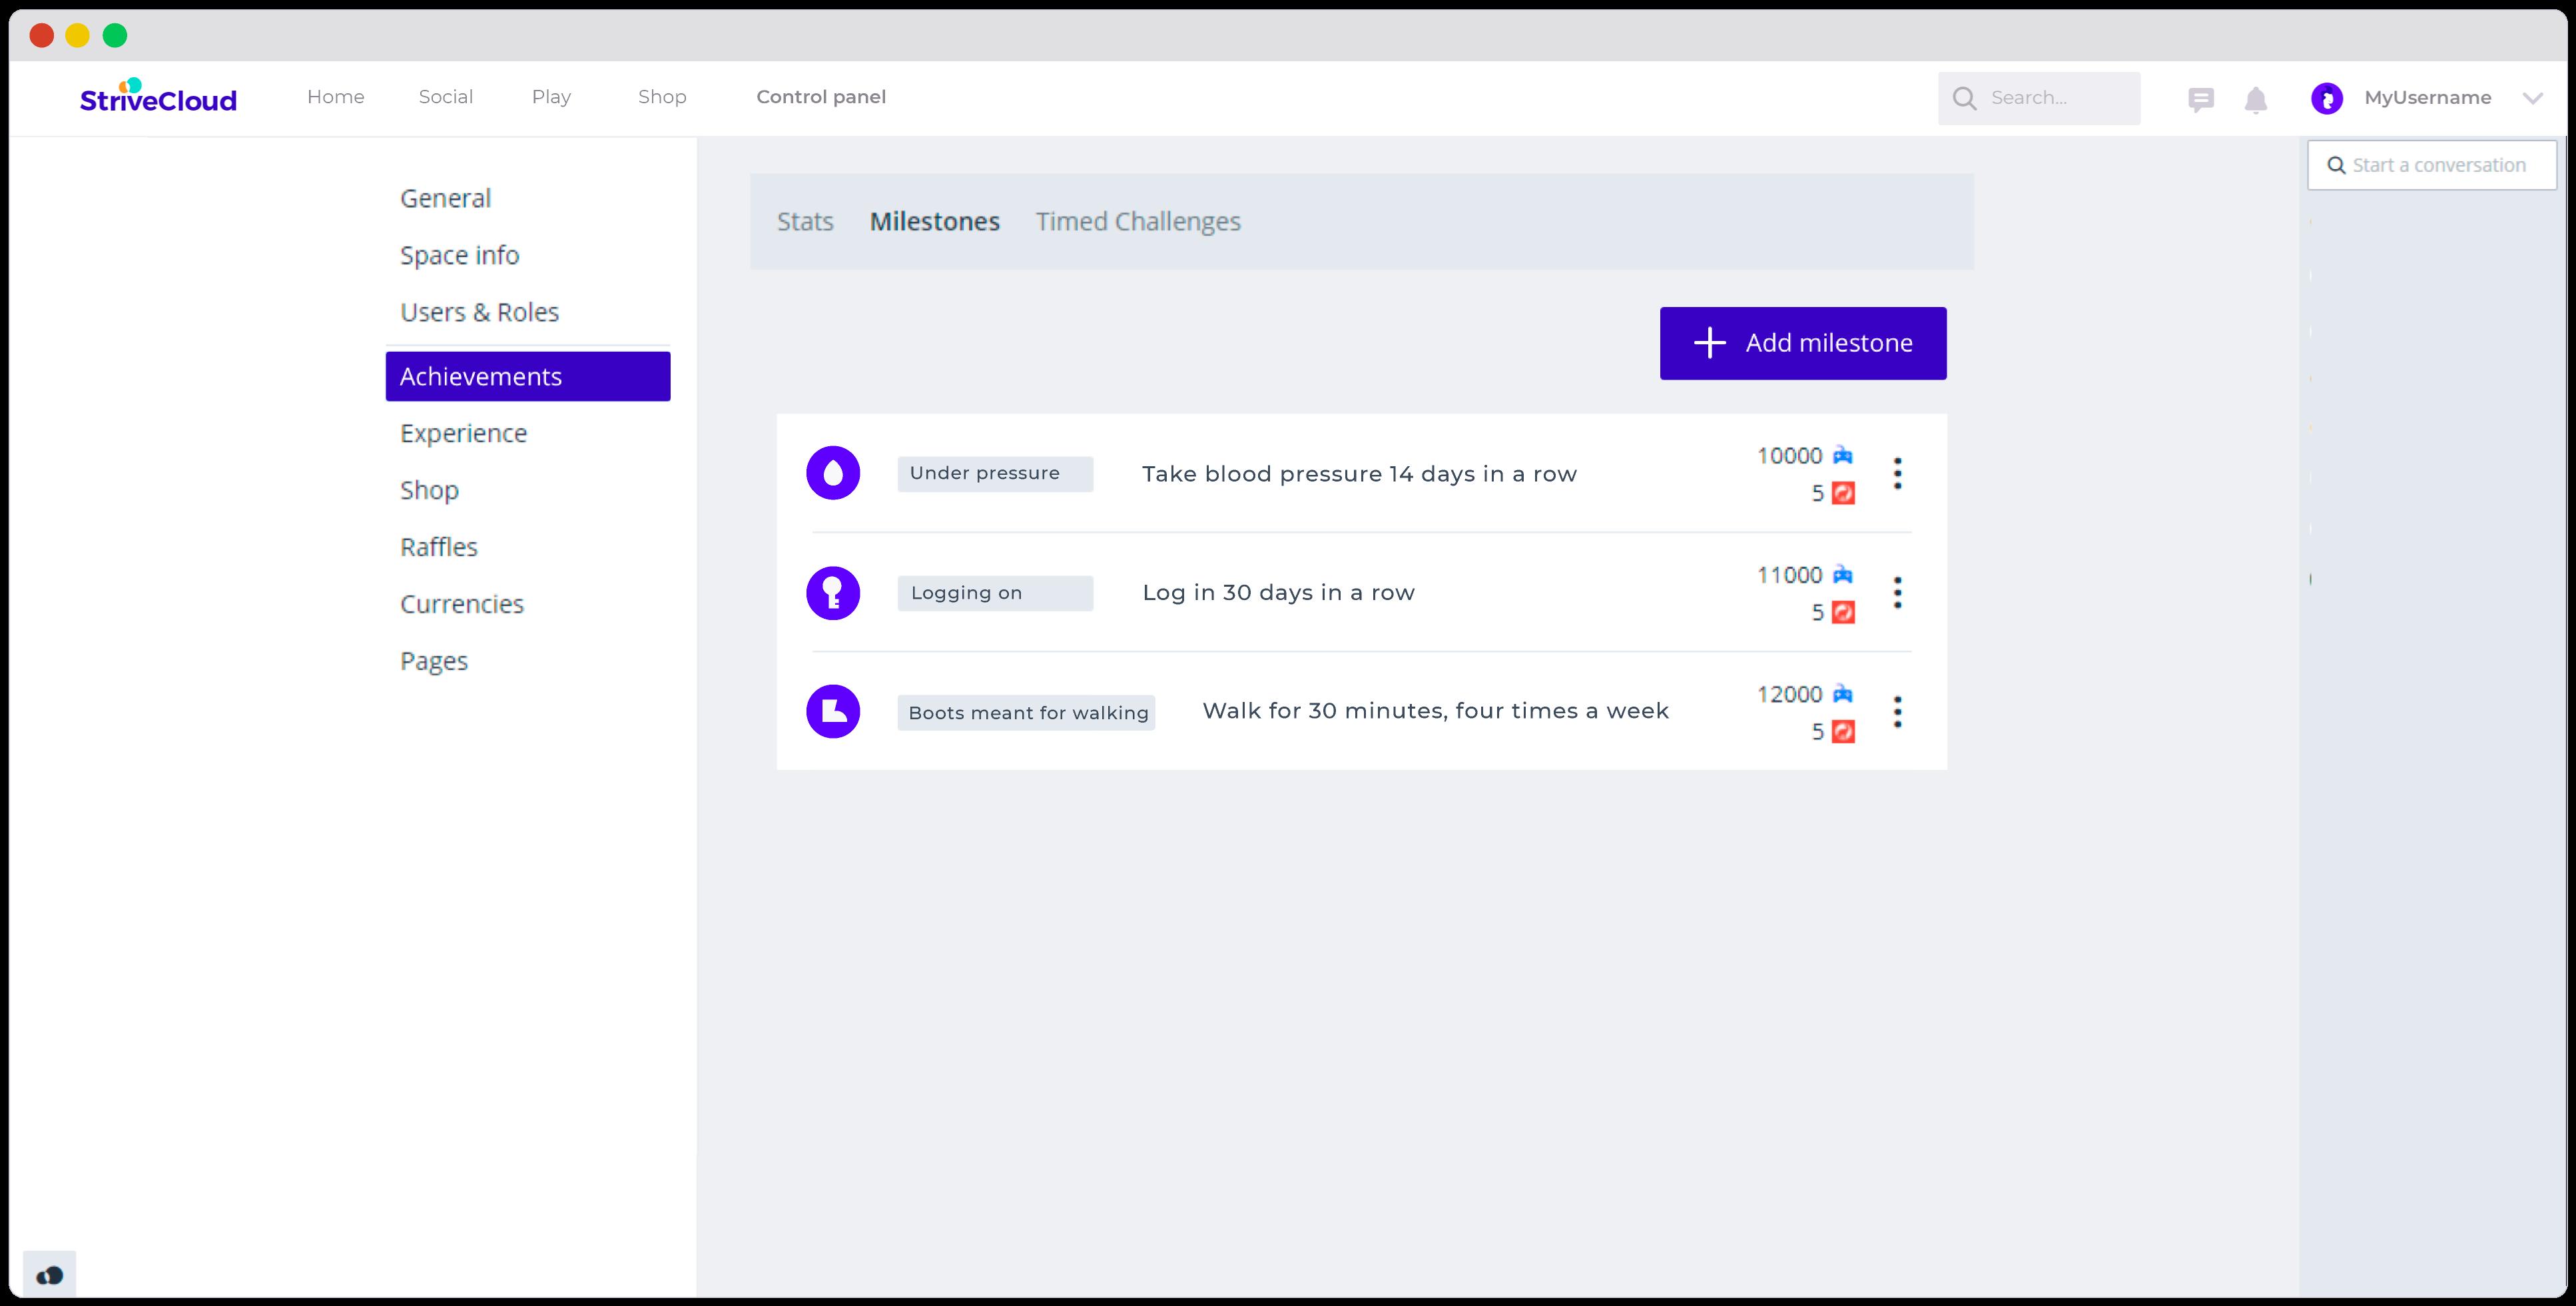 StriveCloud Achievements & Milestones example